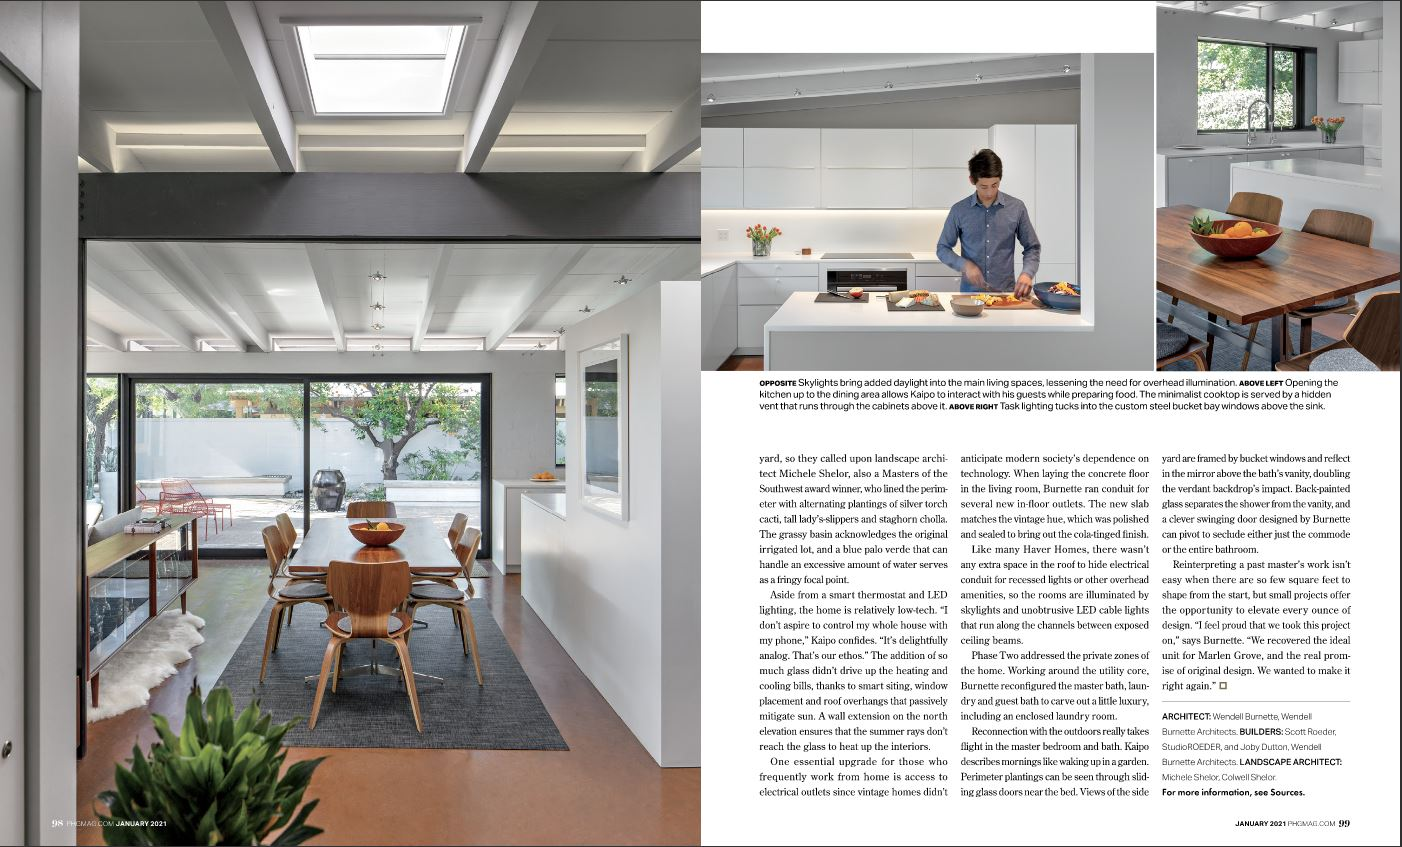 Phoenix Home & Garden: Embracing the New P4